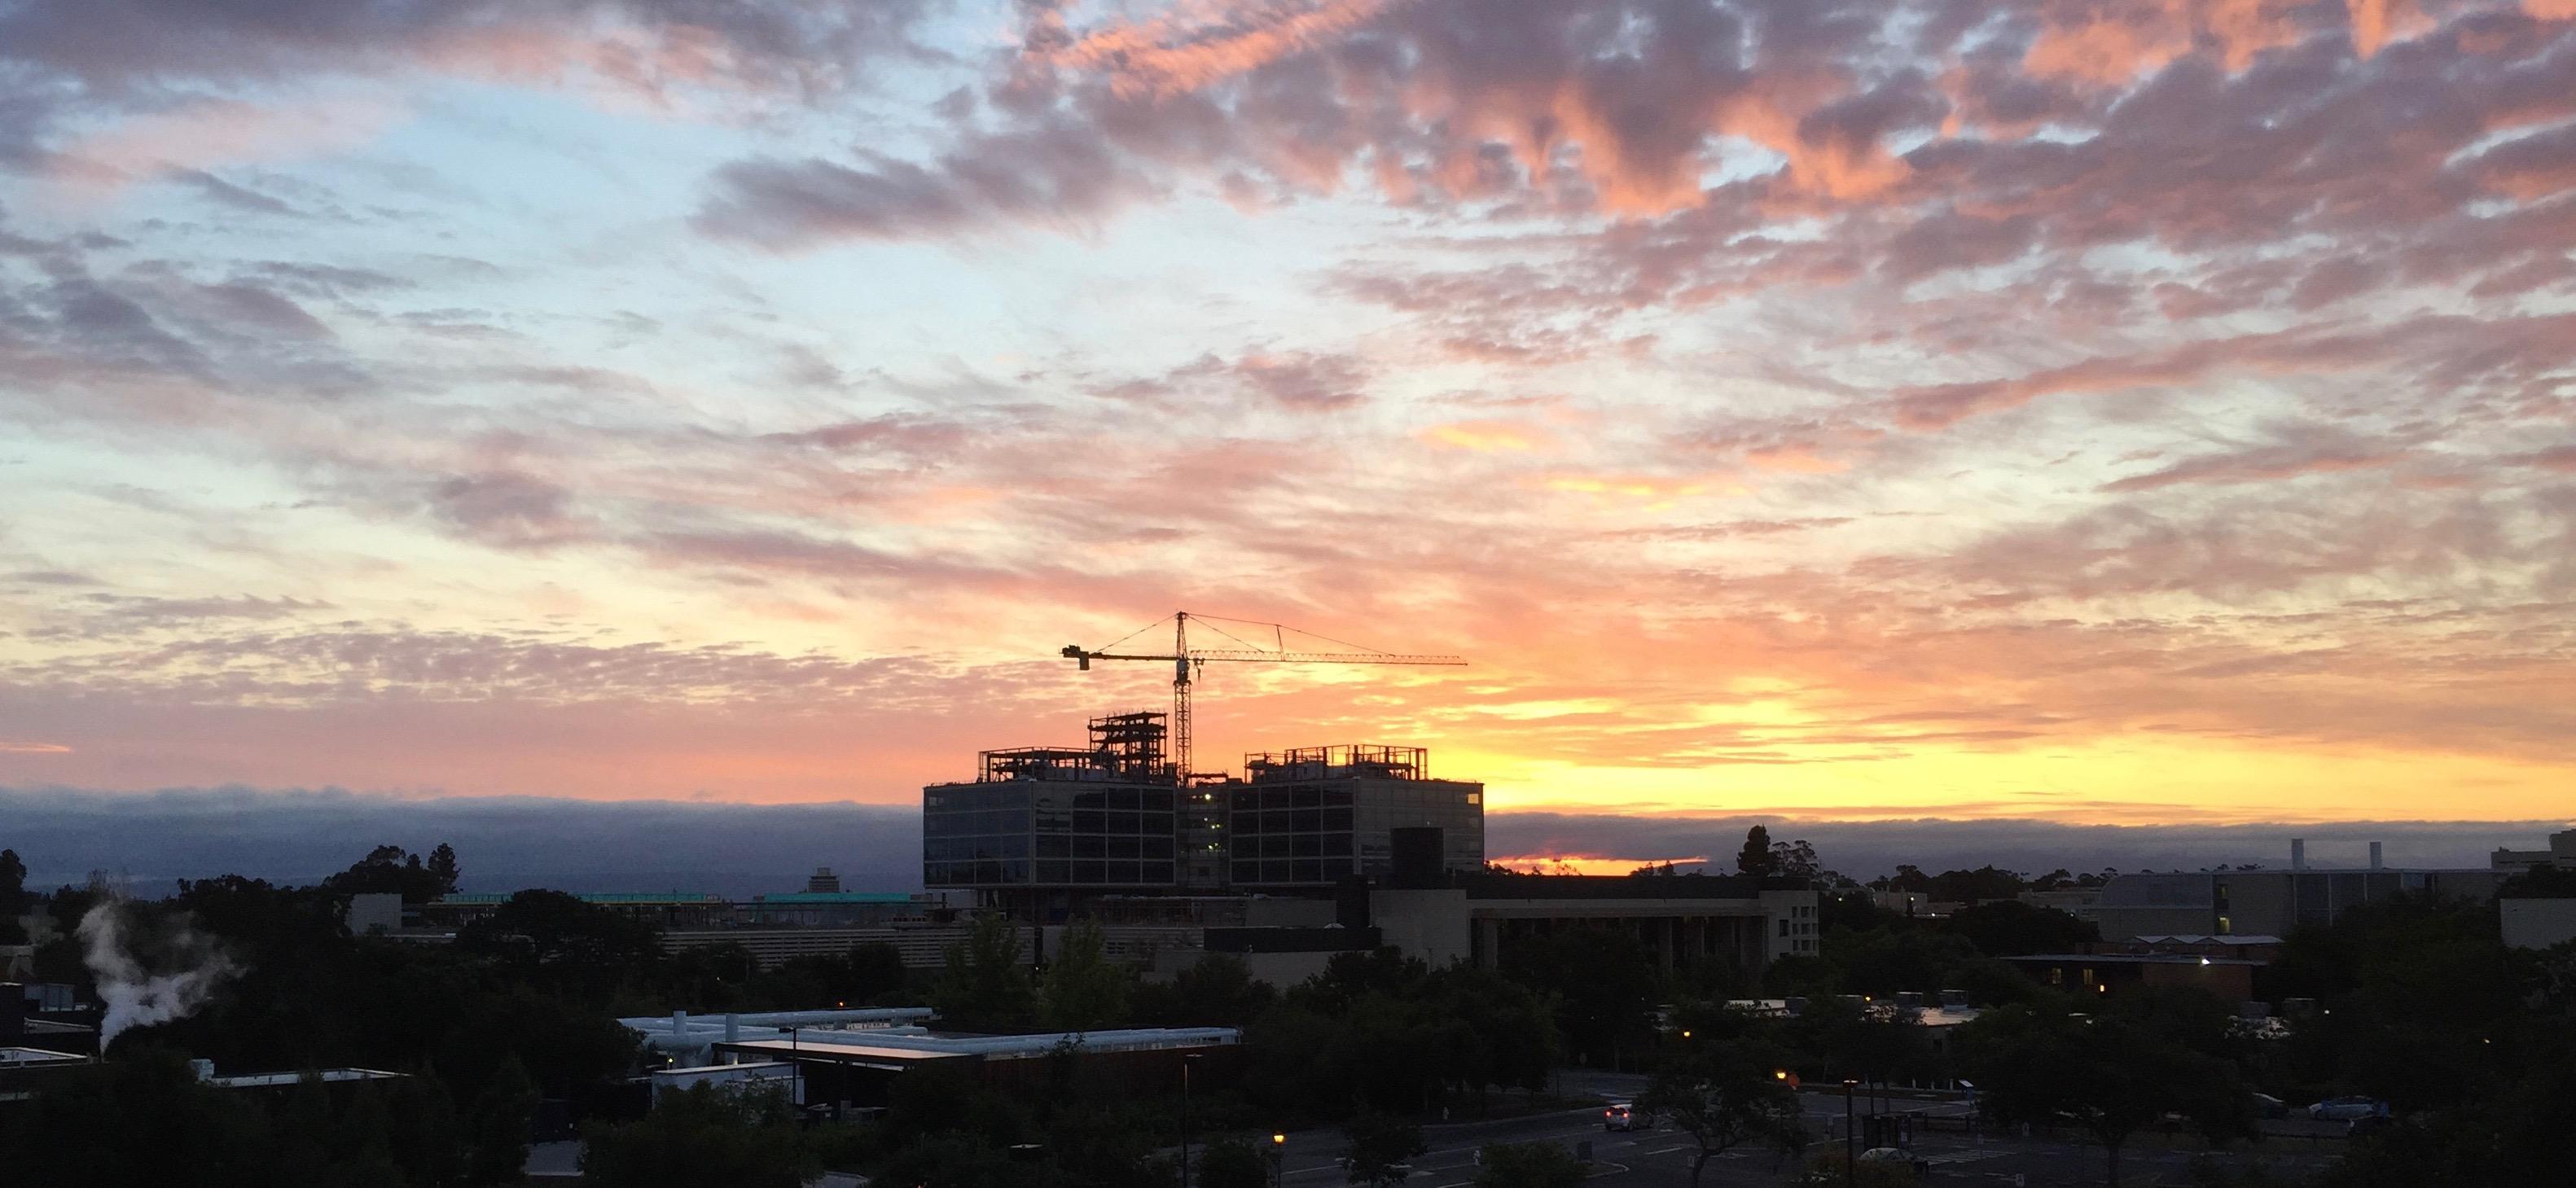 New Stanford Hospital at Sunrise